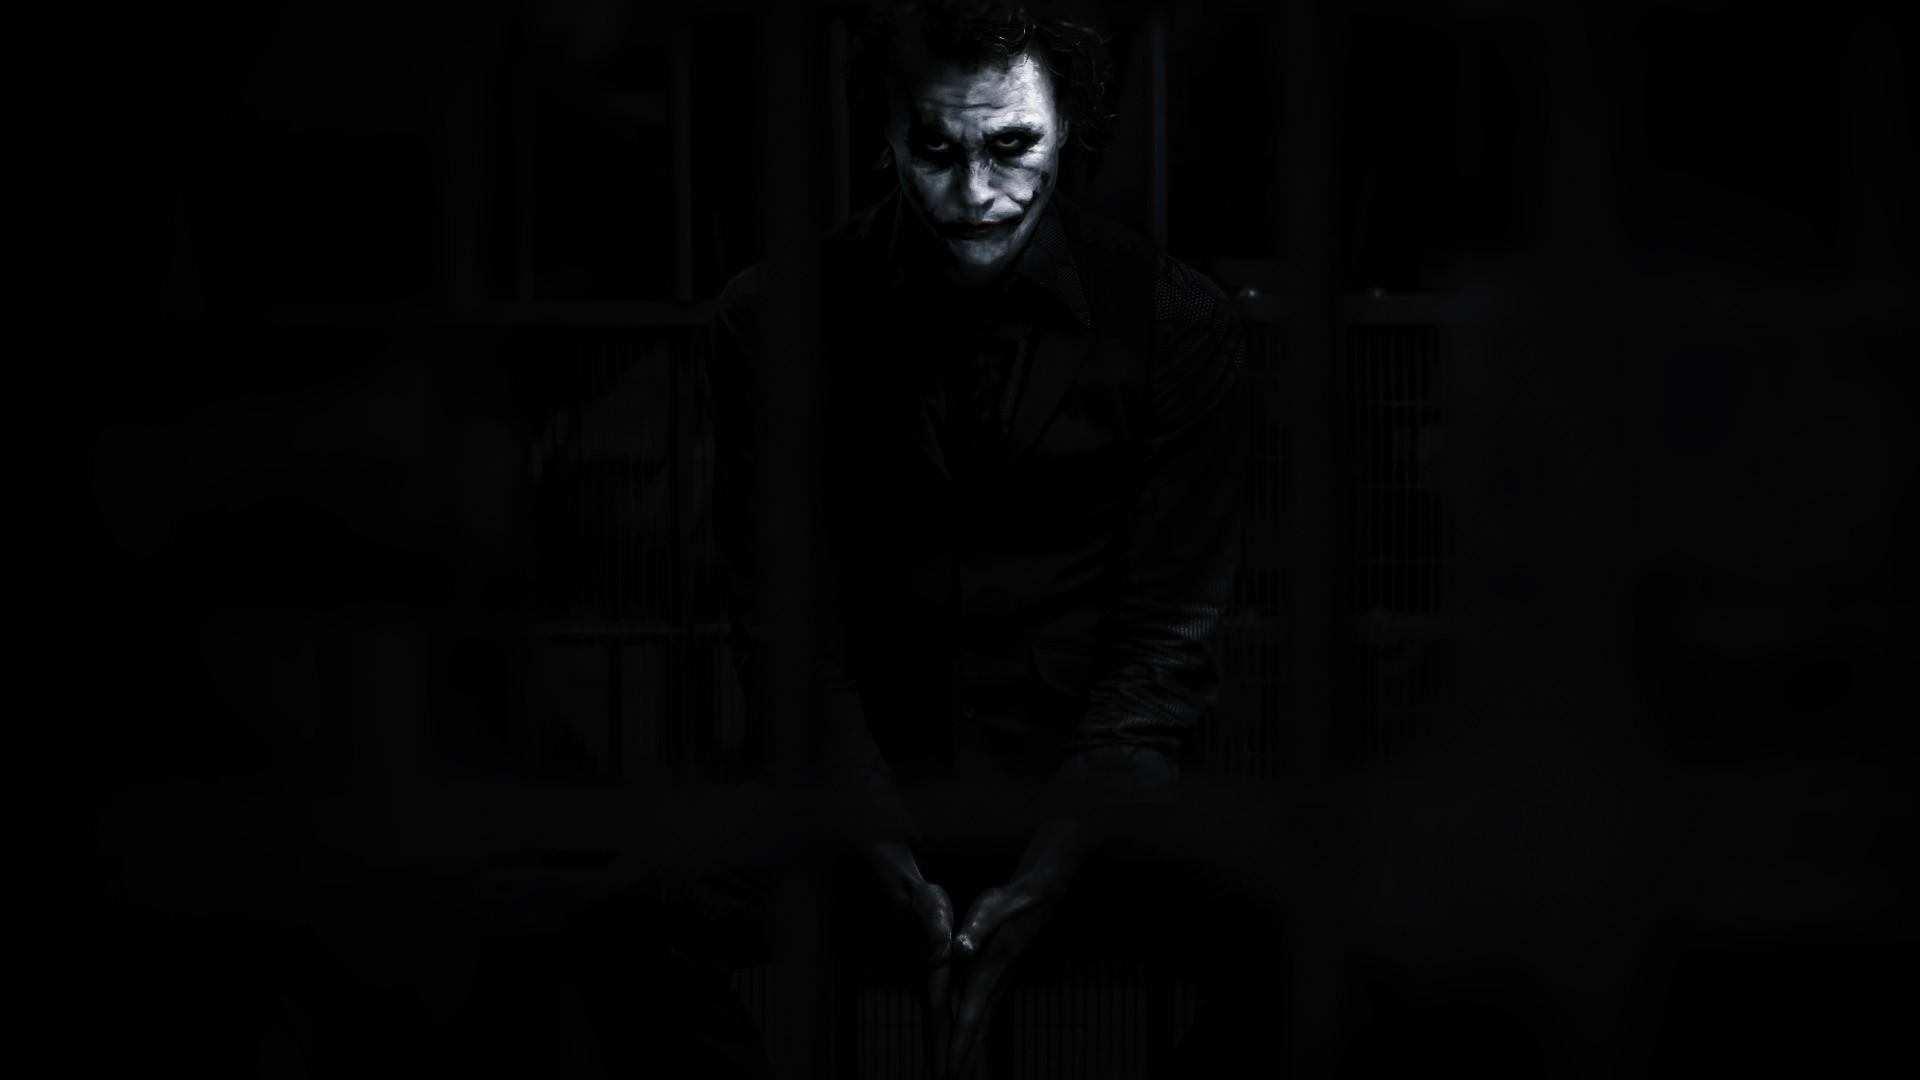 Wallpaper The Dark Knight Batman Joker Movies Heath